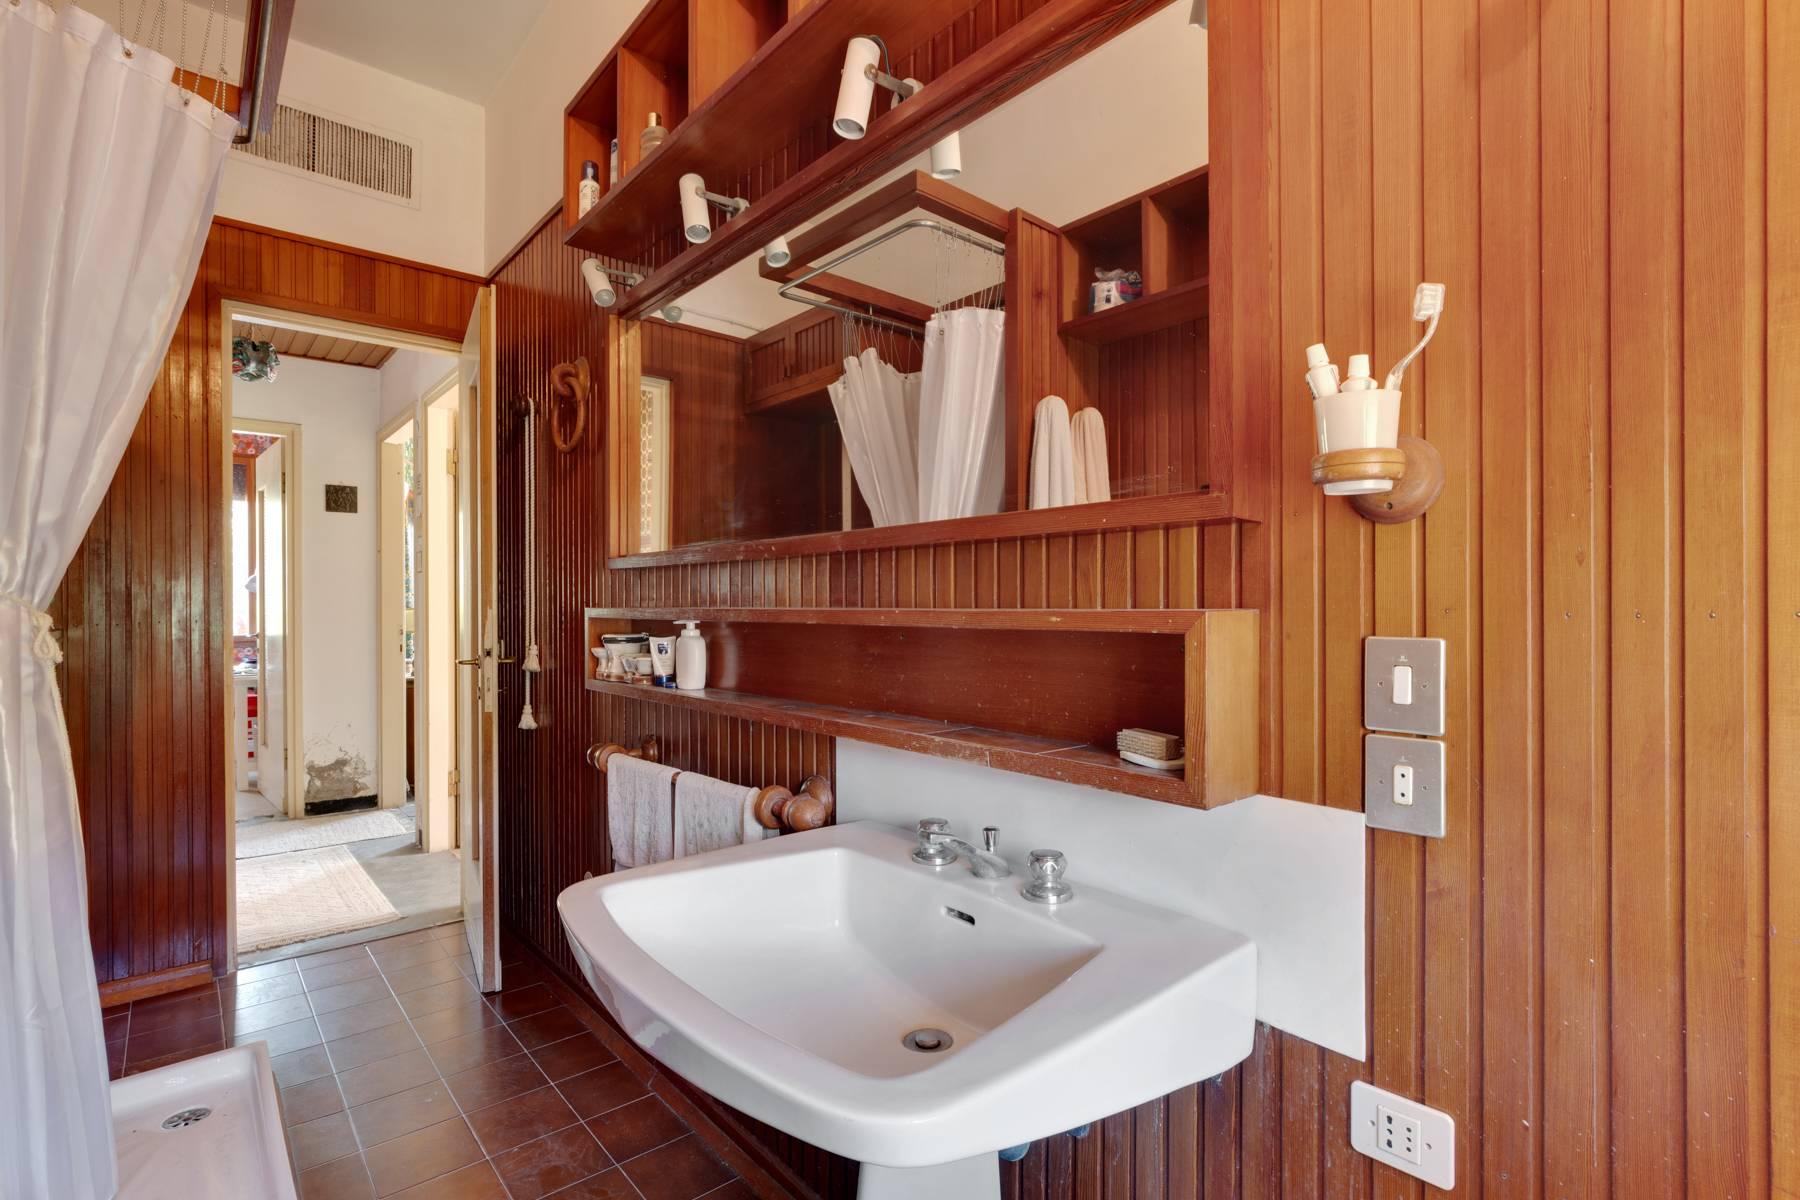 Villa in Vendita a Stresa: 5 locali, 150 mq - Foto 23